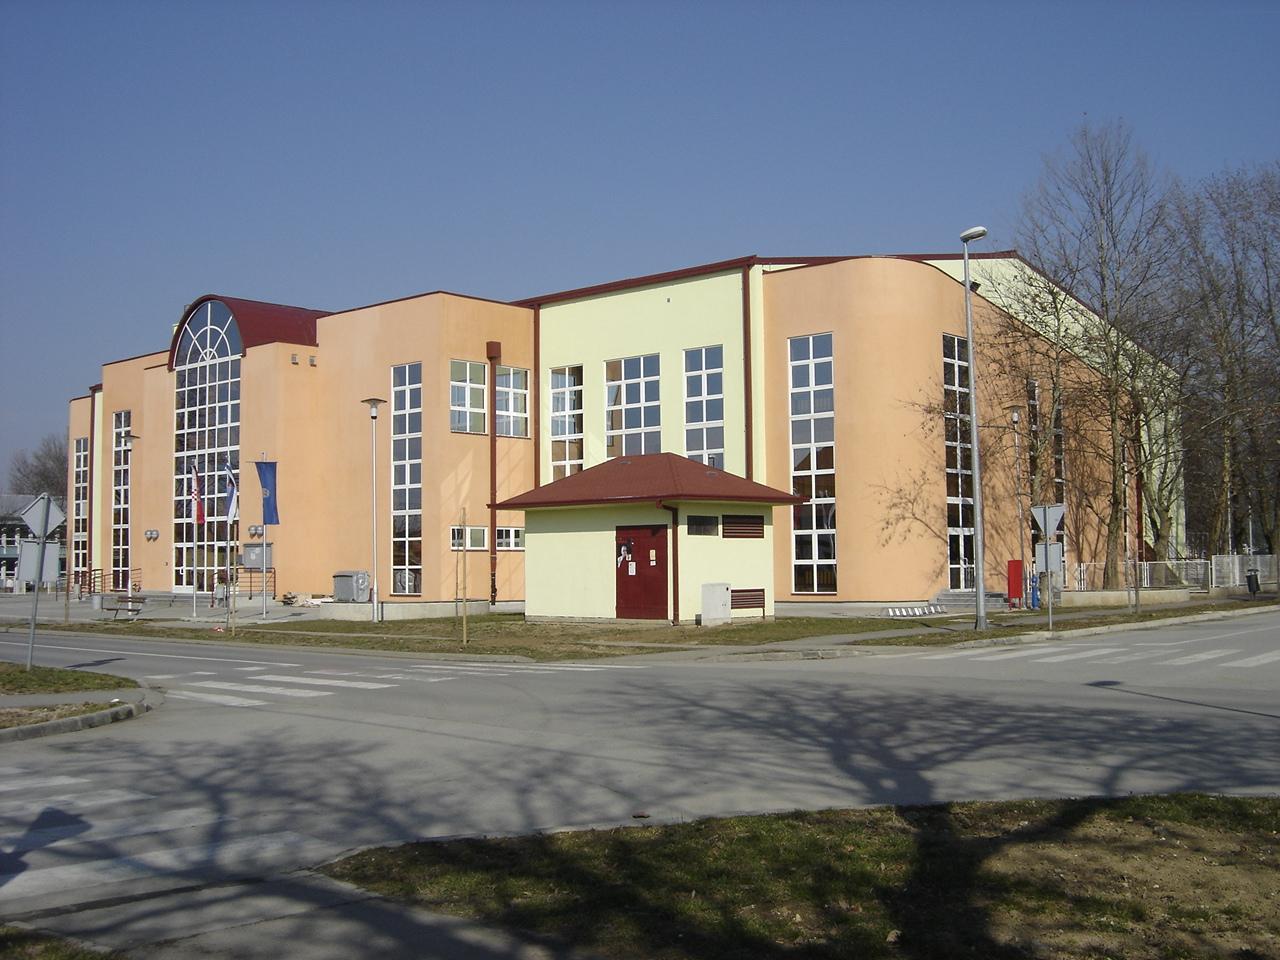 Beli Manastir #